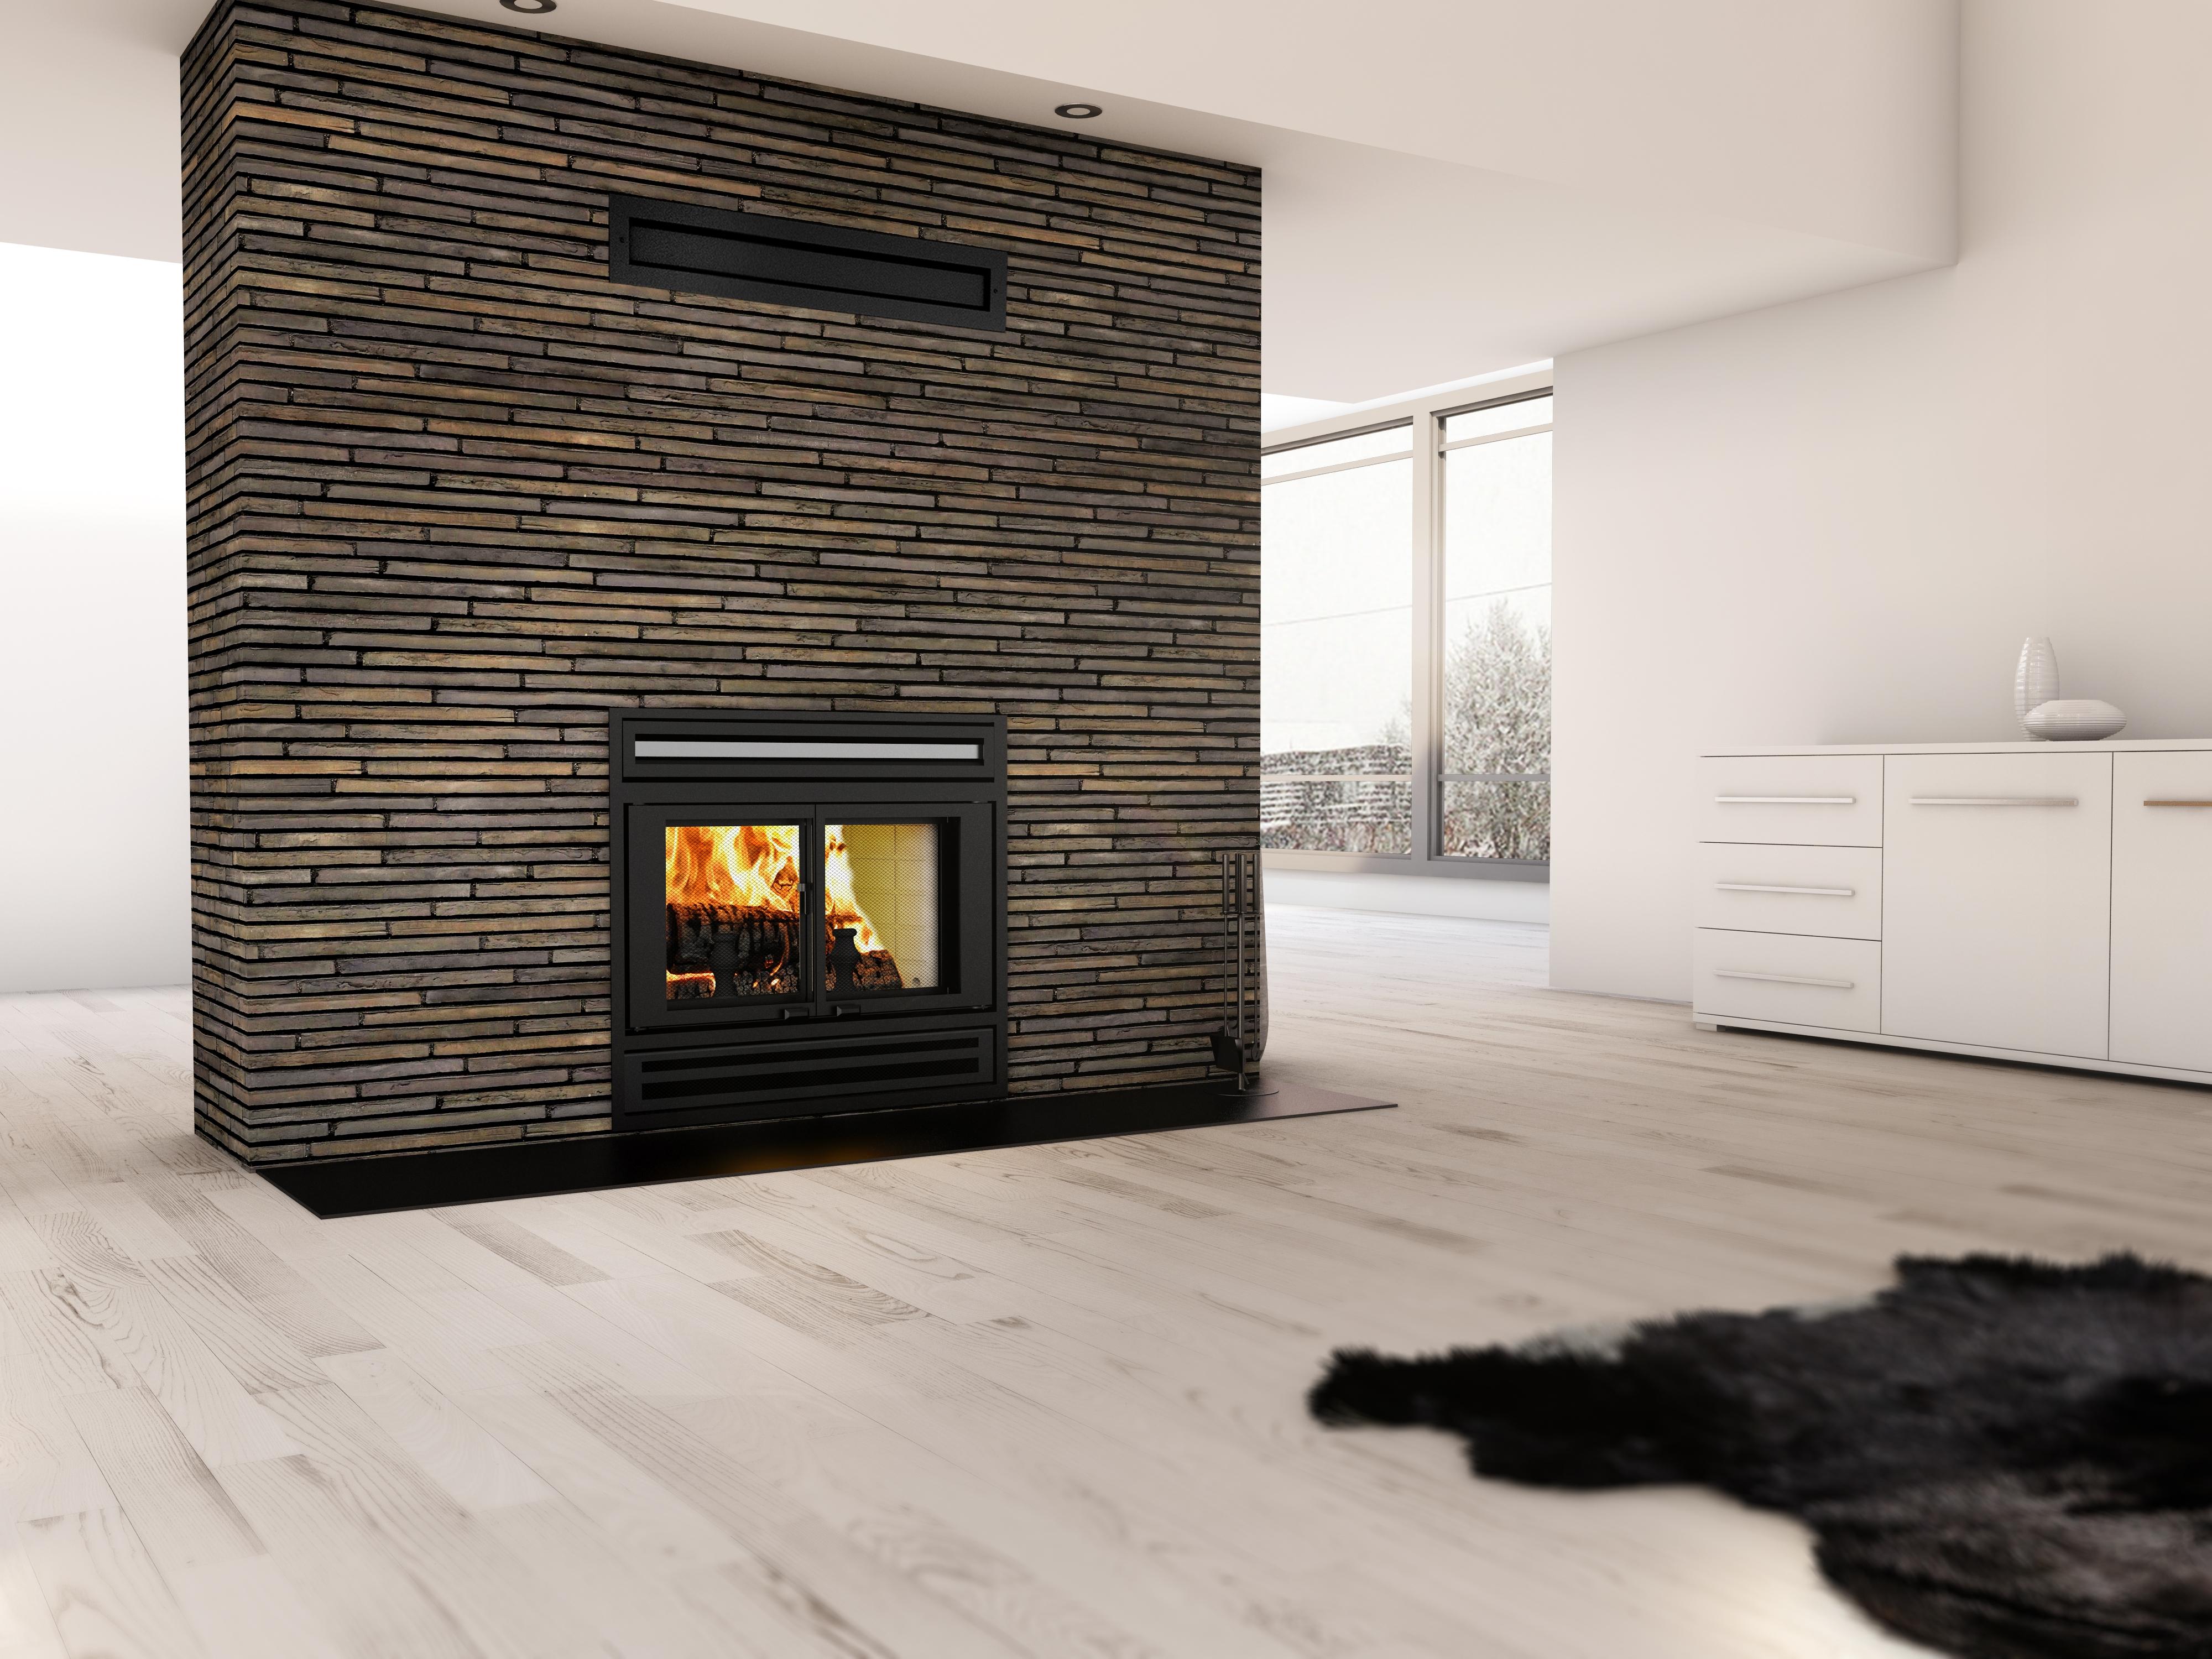 firesfriendly blower kodiak products enviro fireplace fires wood hgtv burning friendly